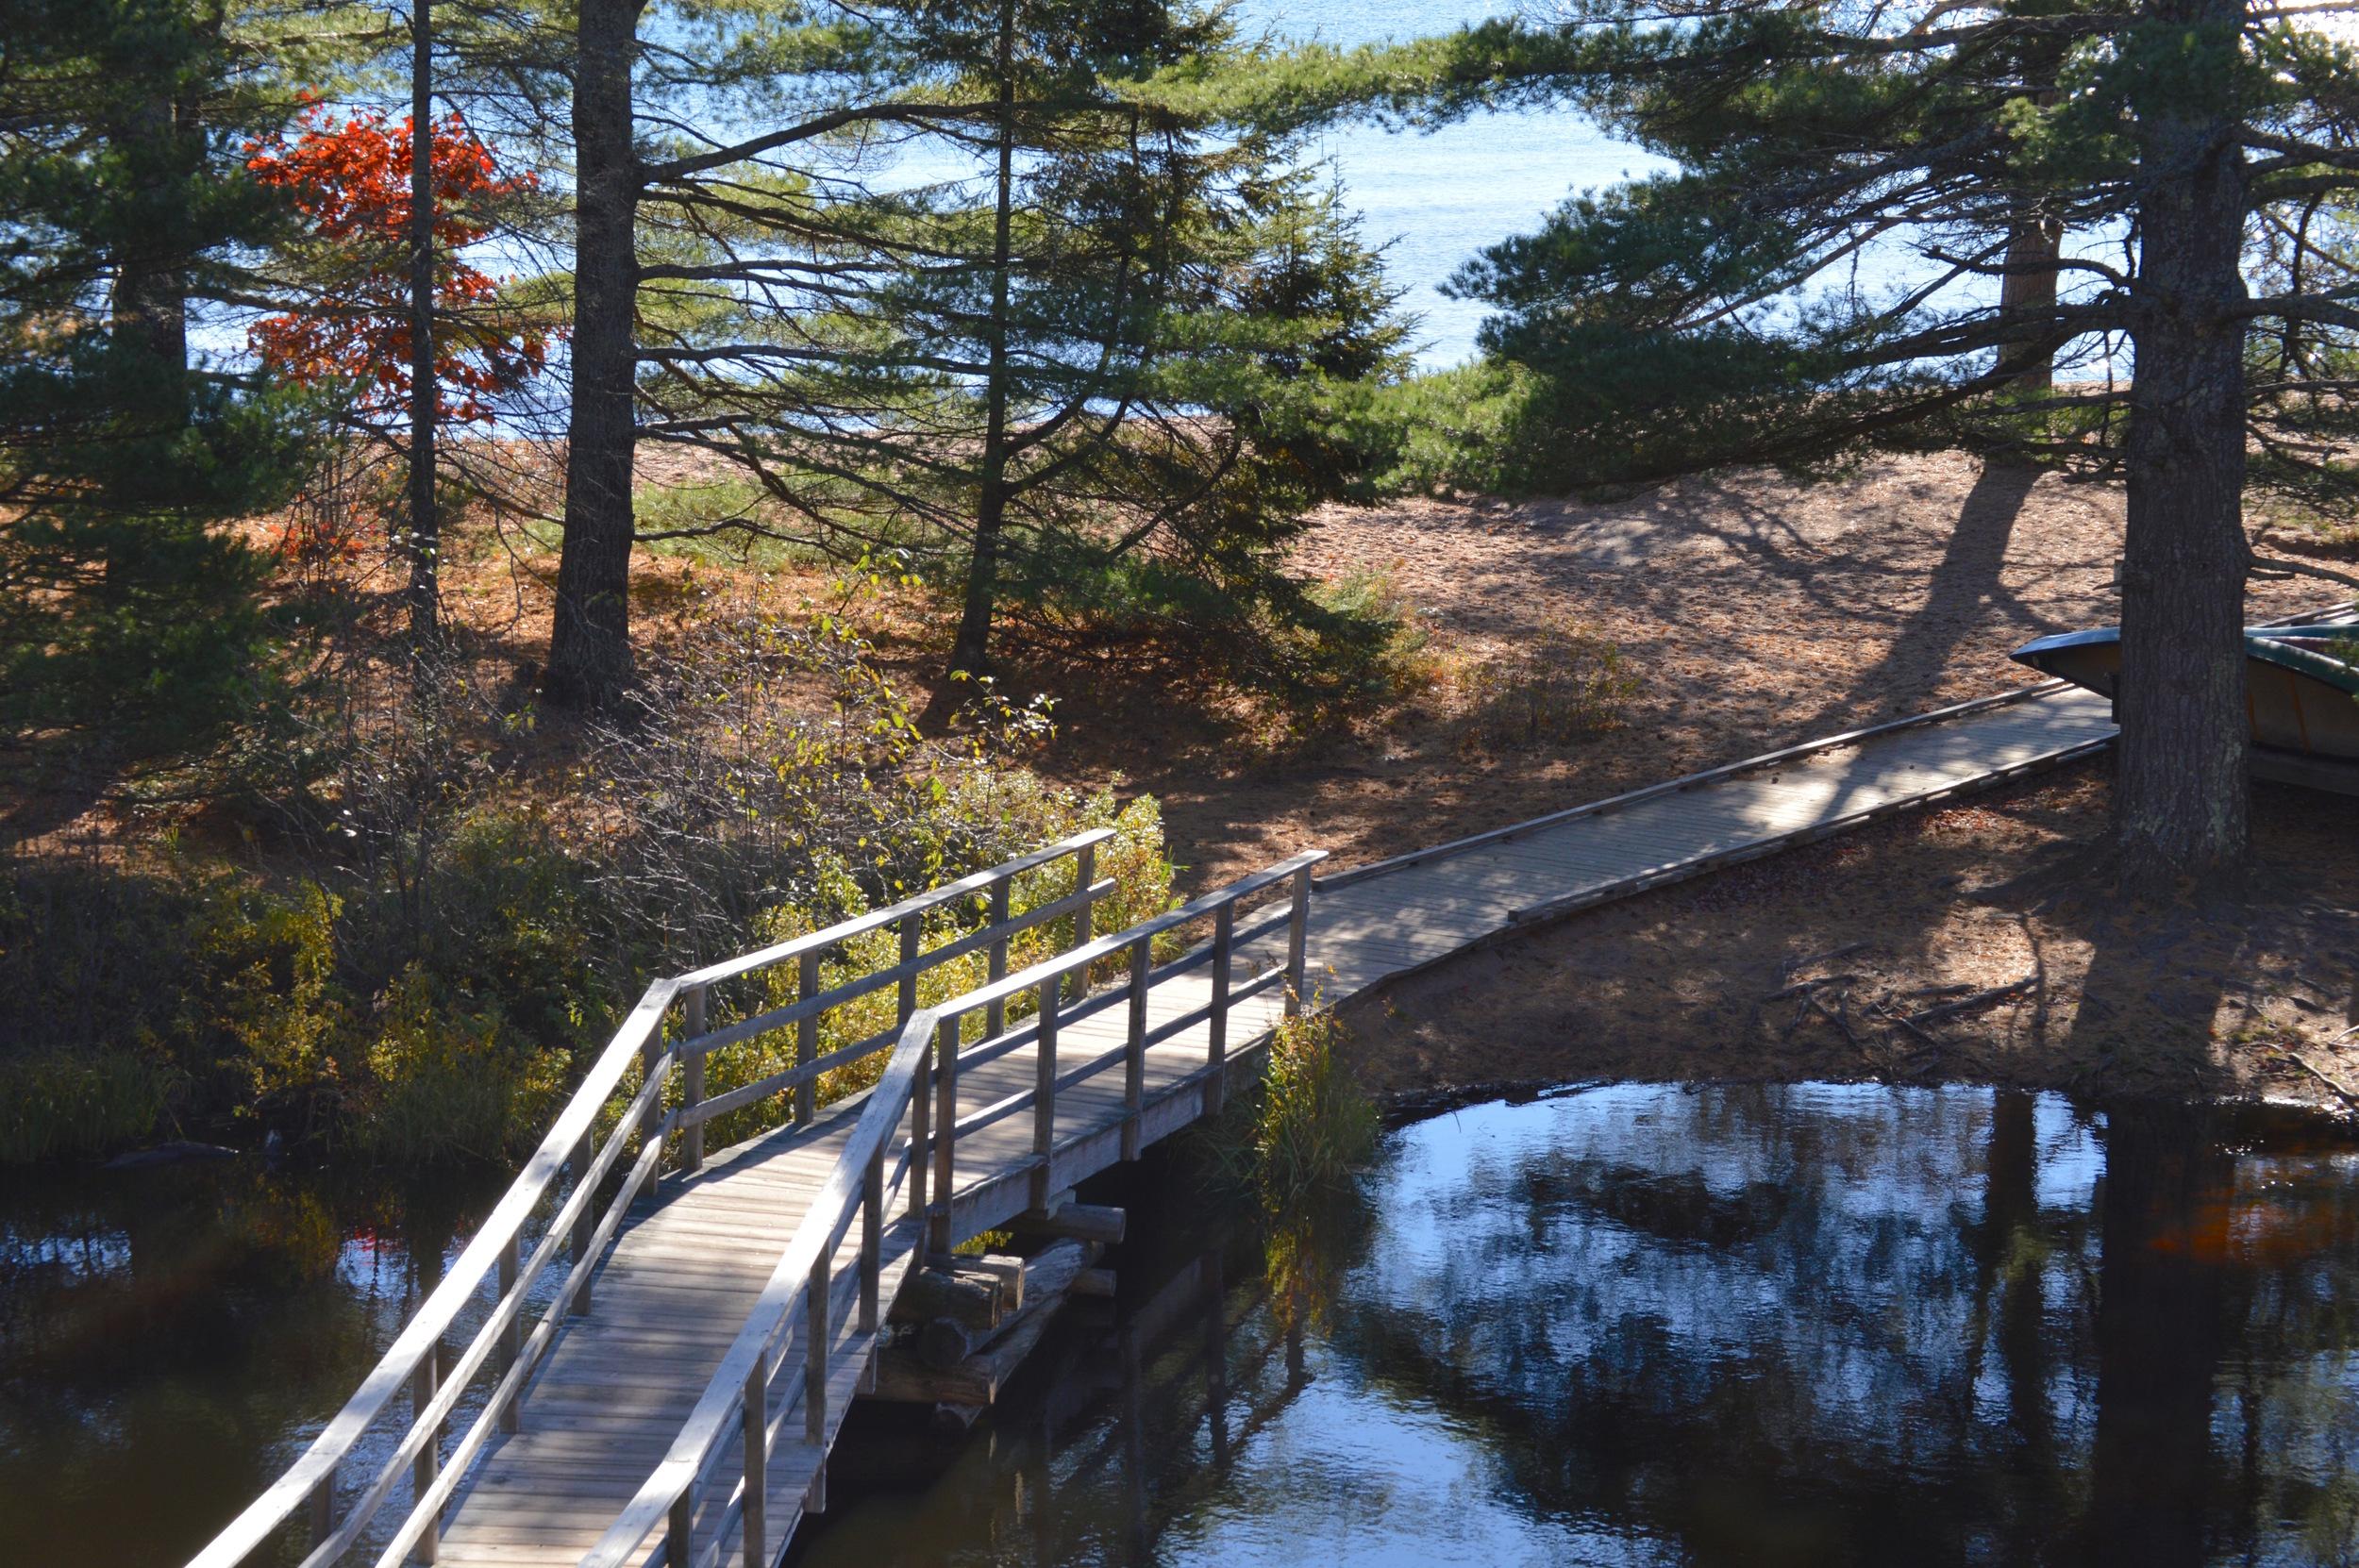 The Bridge Over Lagoon to Beach